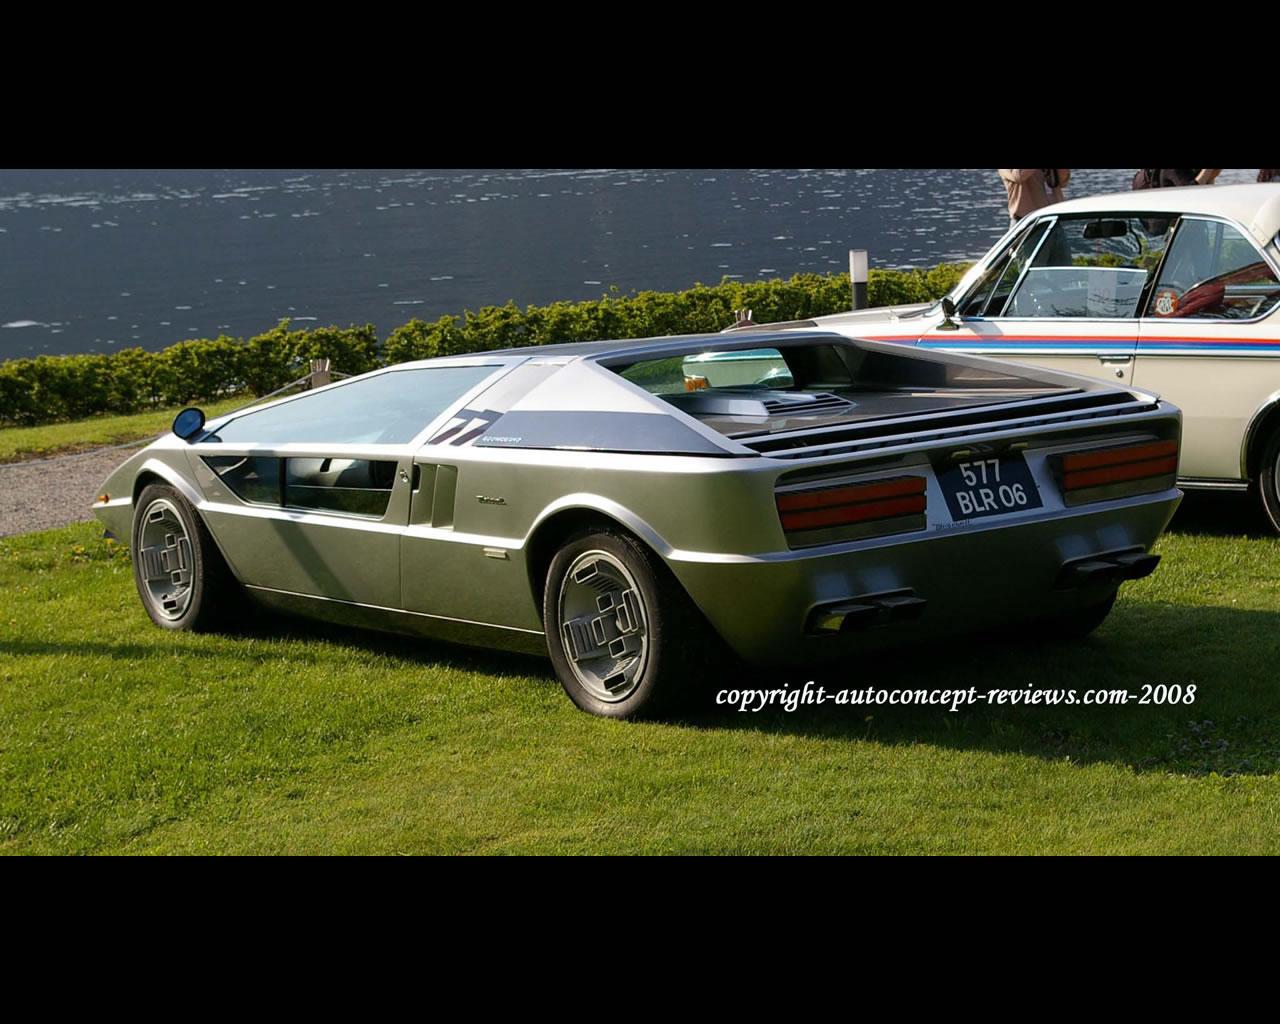 Free download think the Maserati Boomerang would make a fine